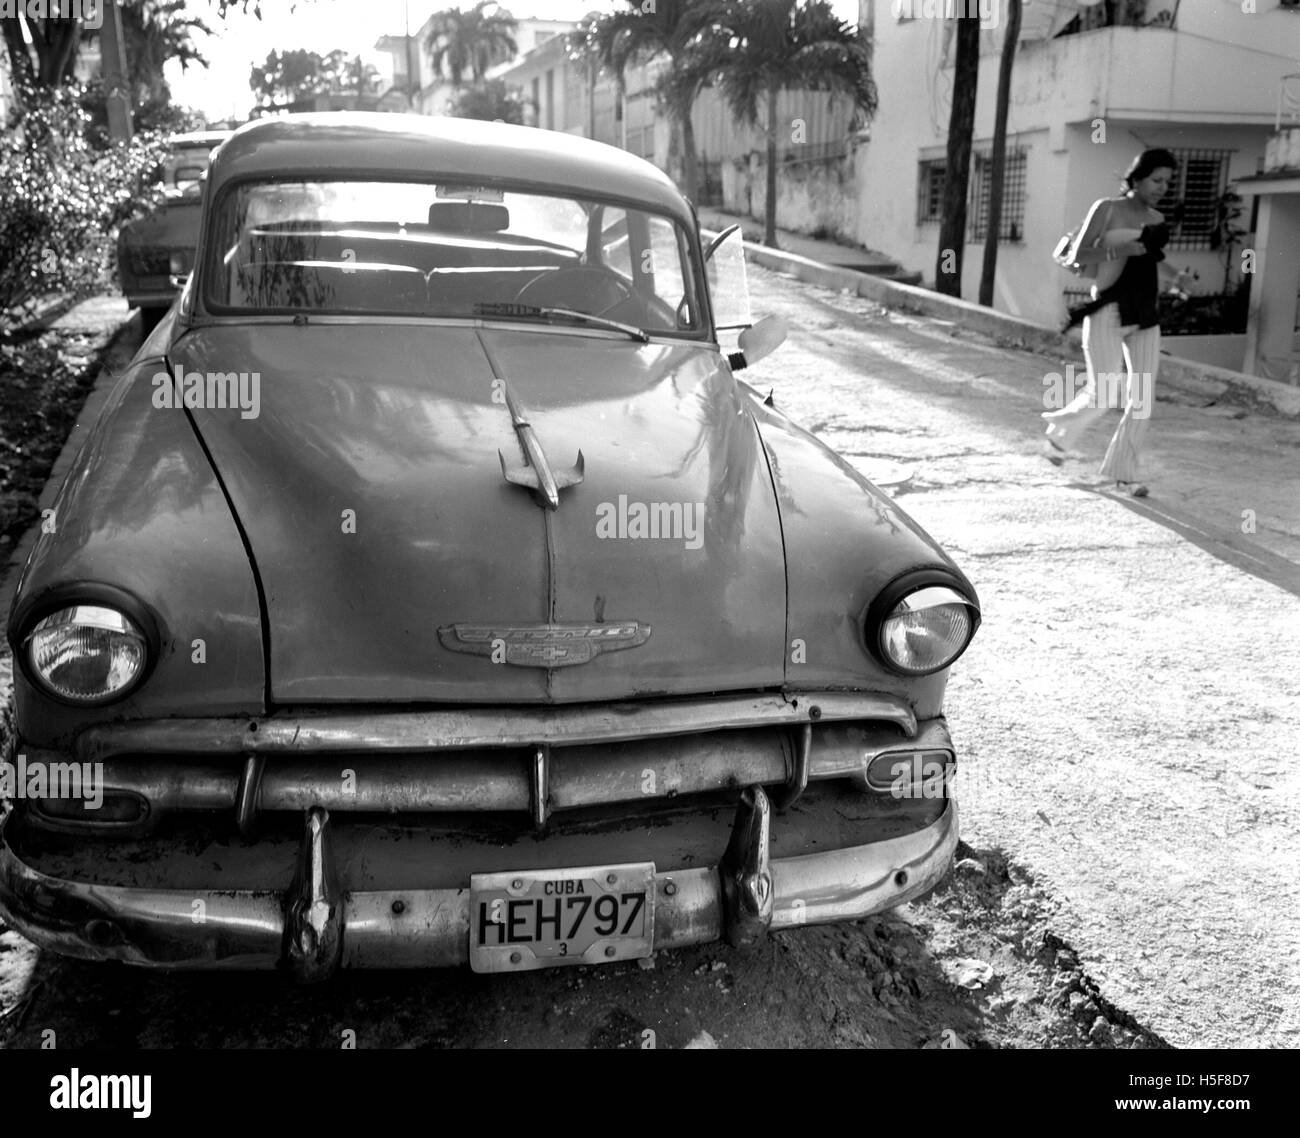 Havana, CUBA. 15th Feb, 2006. Young Cuban girl walks past one of many Cuban Maquinas, aka Yank tanks or pre 1960 Stock Photo